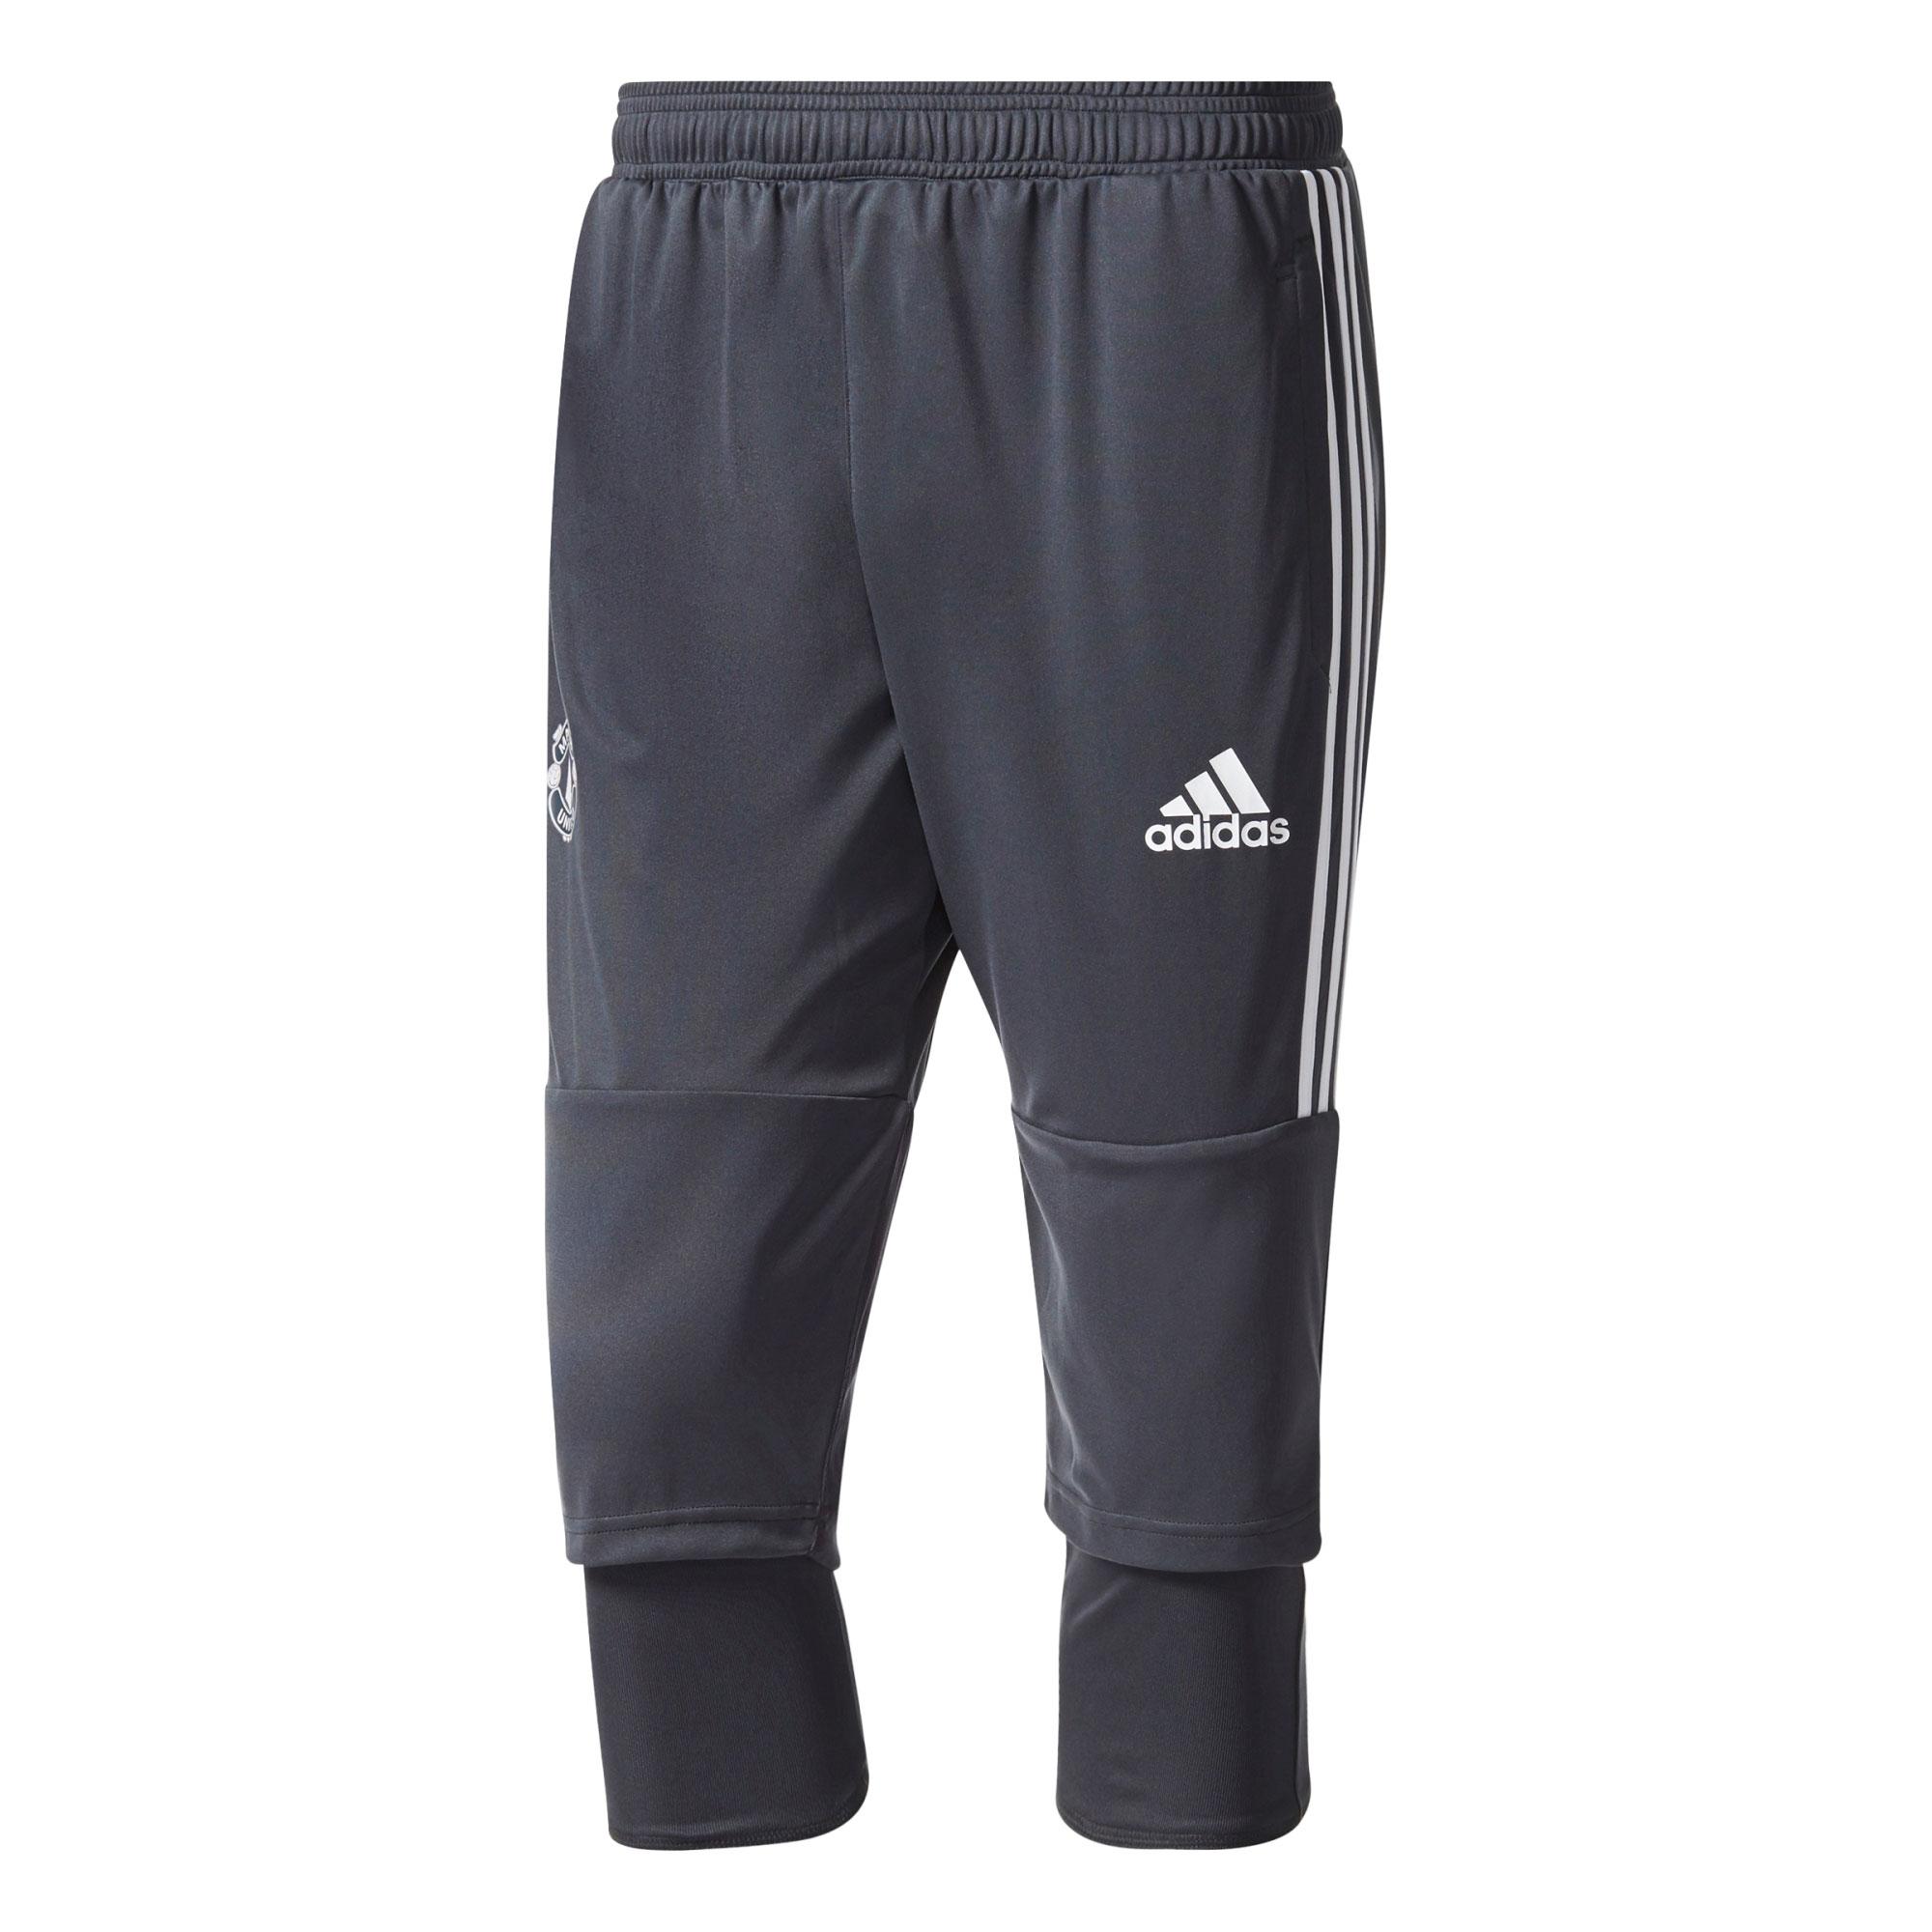 Manchester United Training 3/4 Pant - Dark Grey